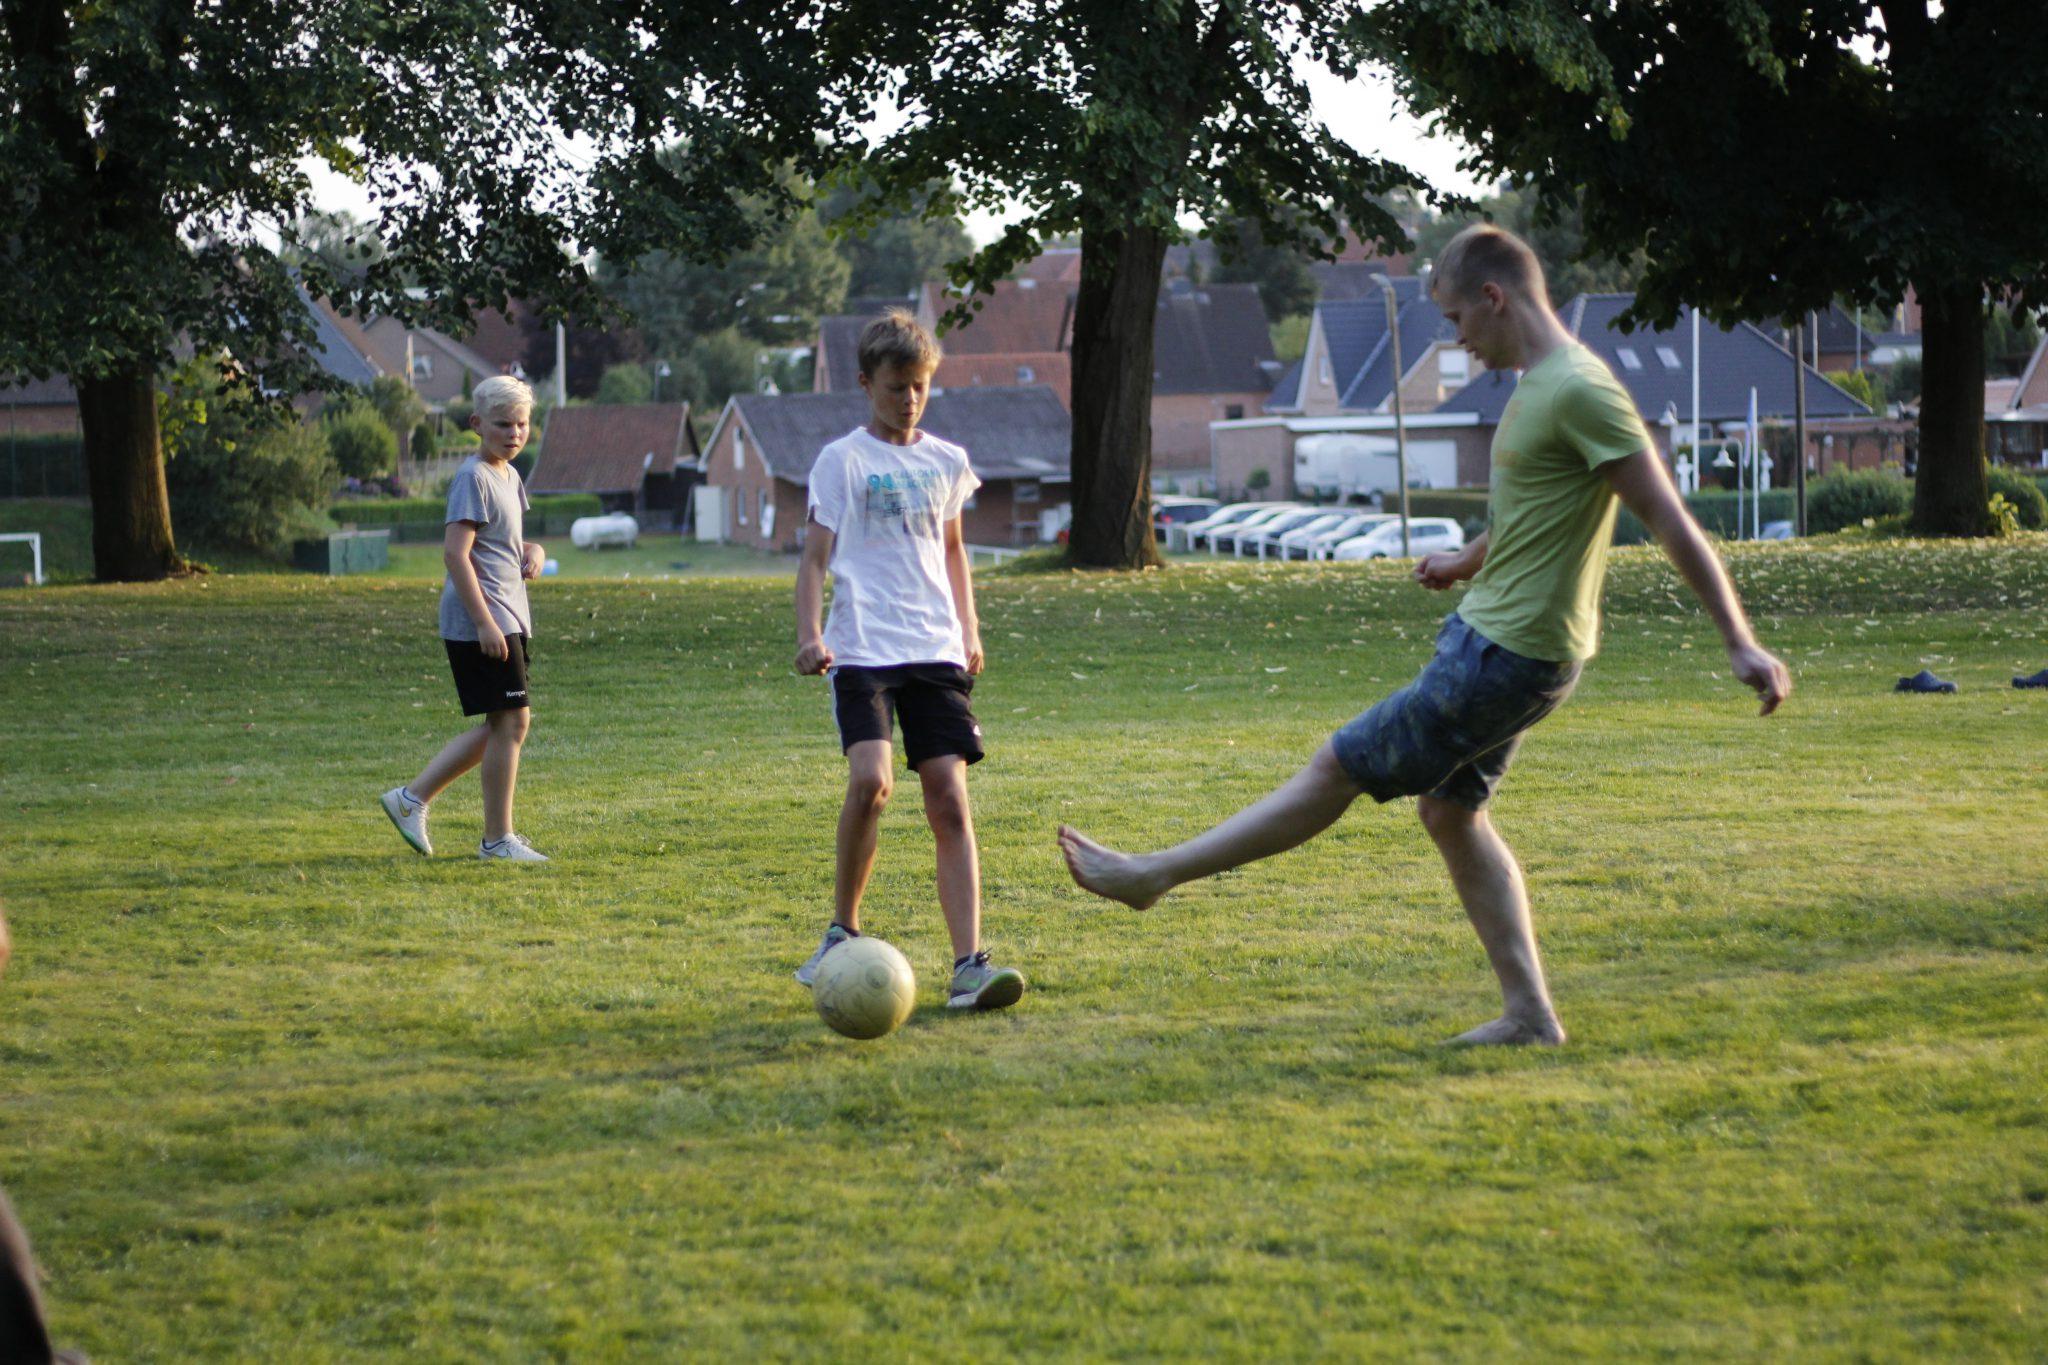 Die Betreuer-Mannschaftschaft war beim Fussball chanchenlos